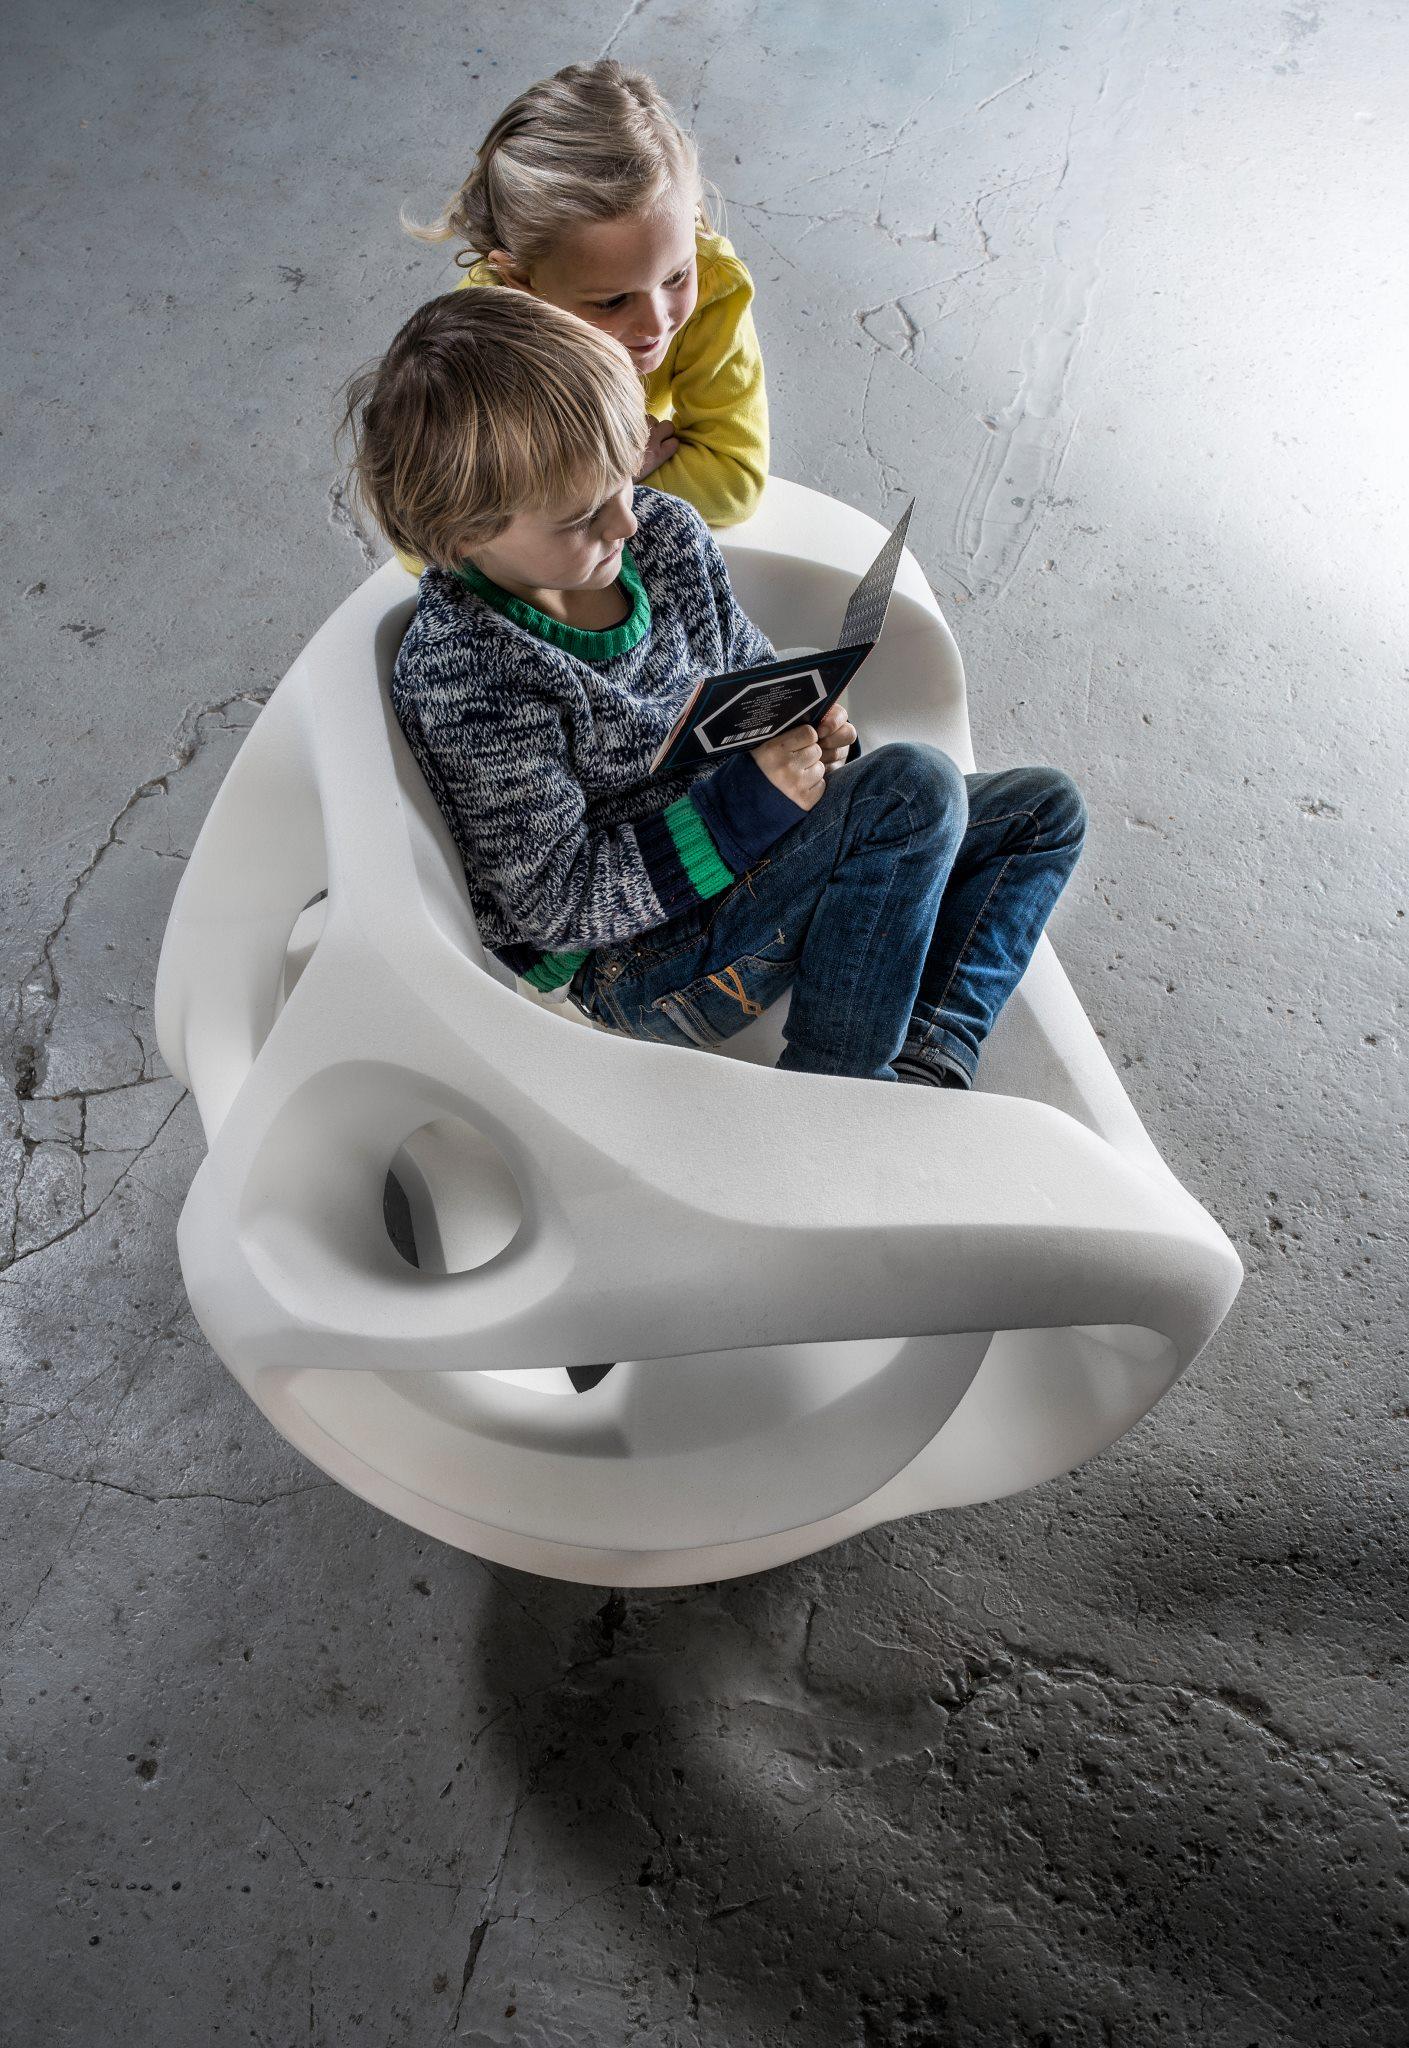 Kinder auf dem Sessel des belgischen Designers Carl de Smet aus Antwerpen.